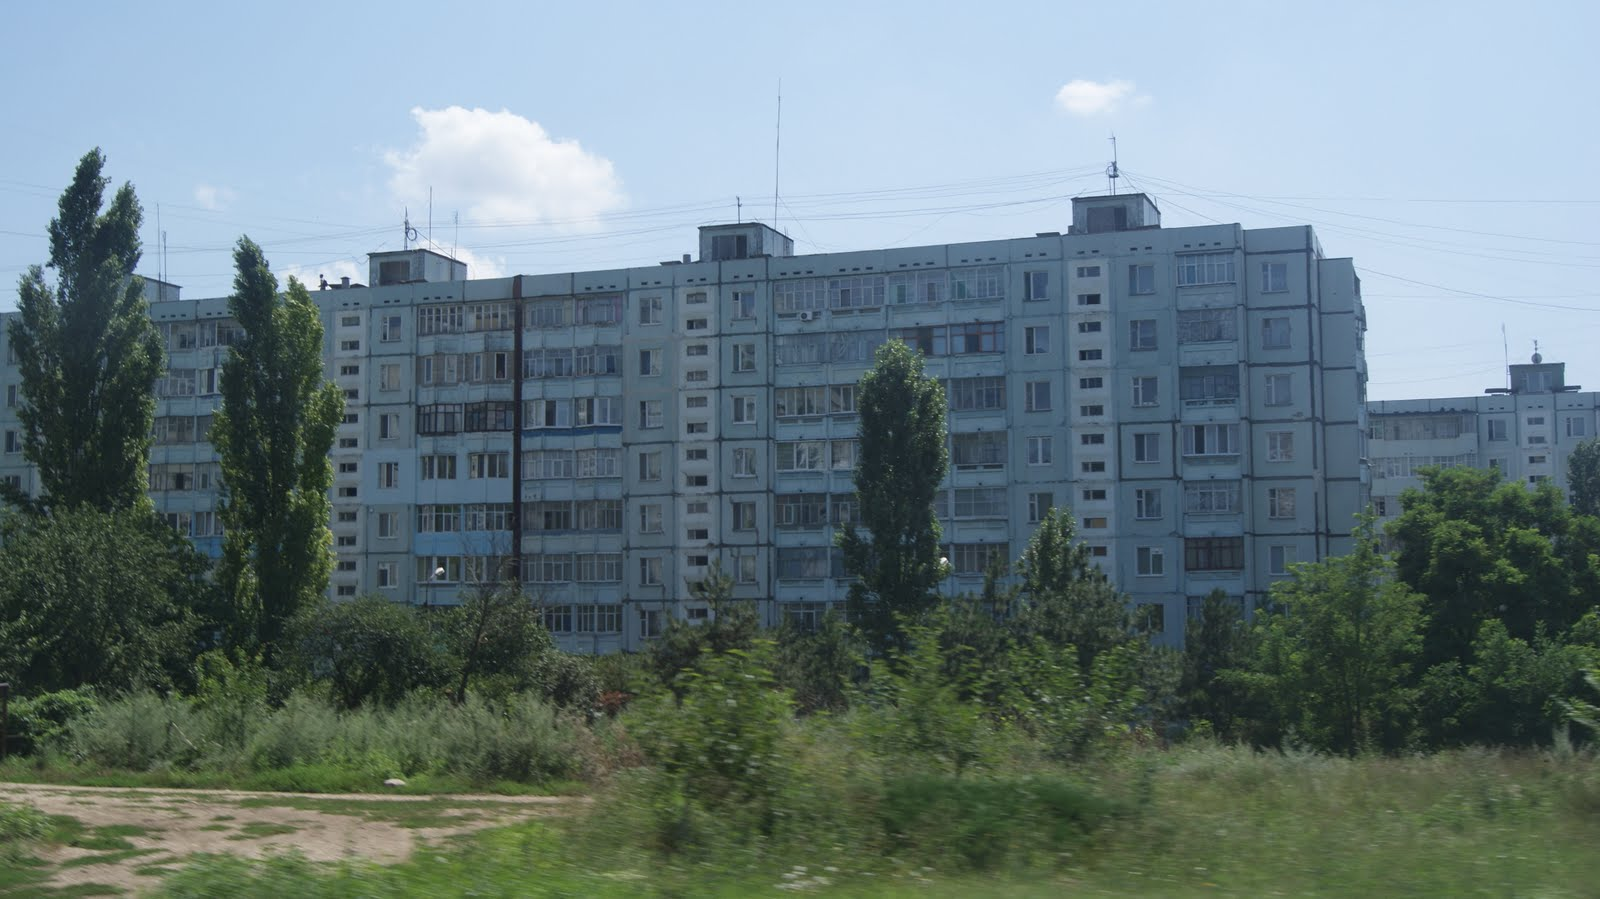 Nueva Moscu de Stalin ,arquitectura Sovietica - Página 2 Arquitectura-sovi%C3%A9tica-en-Transnistria